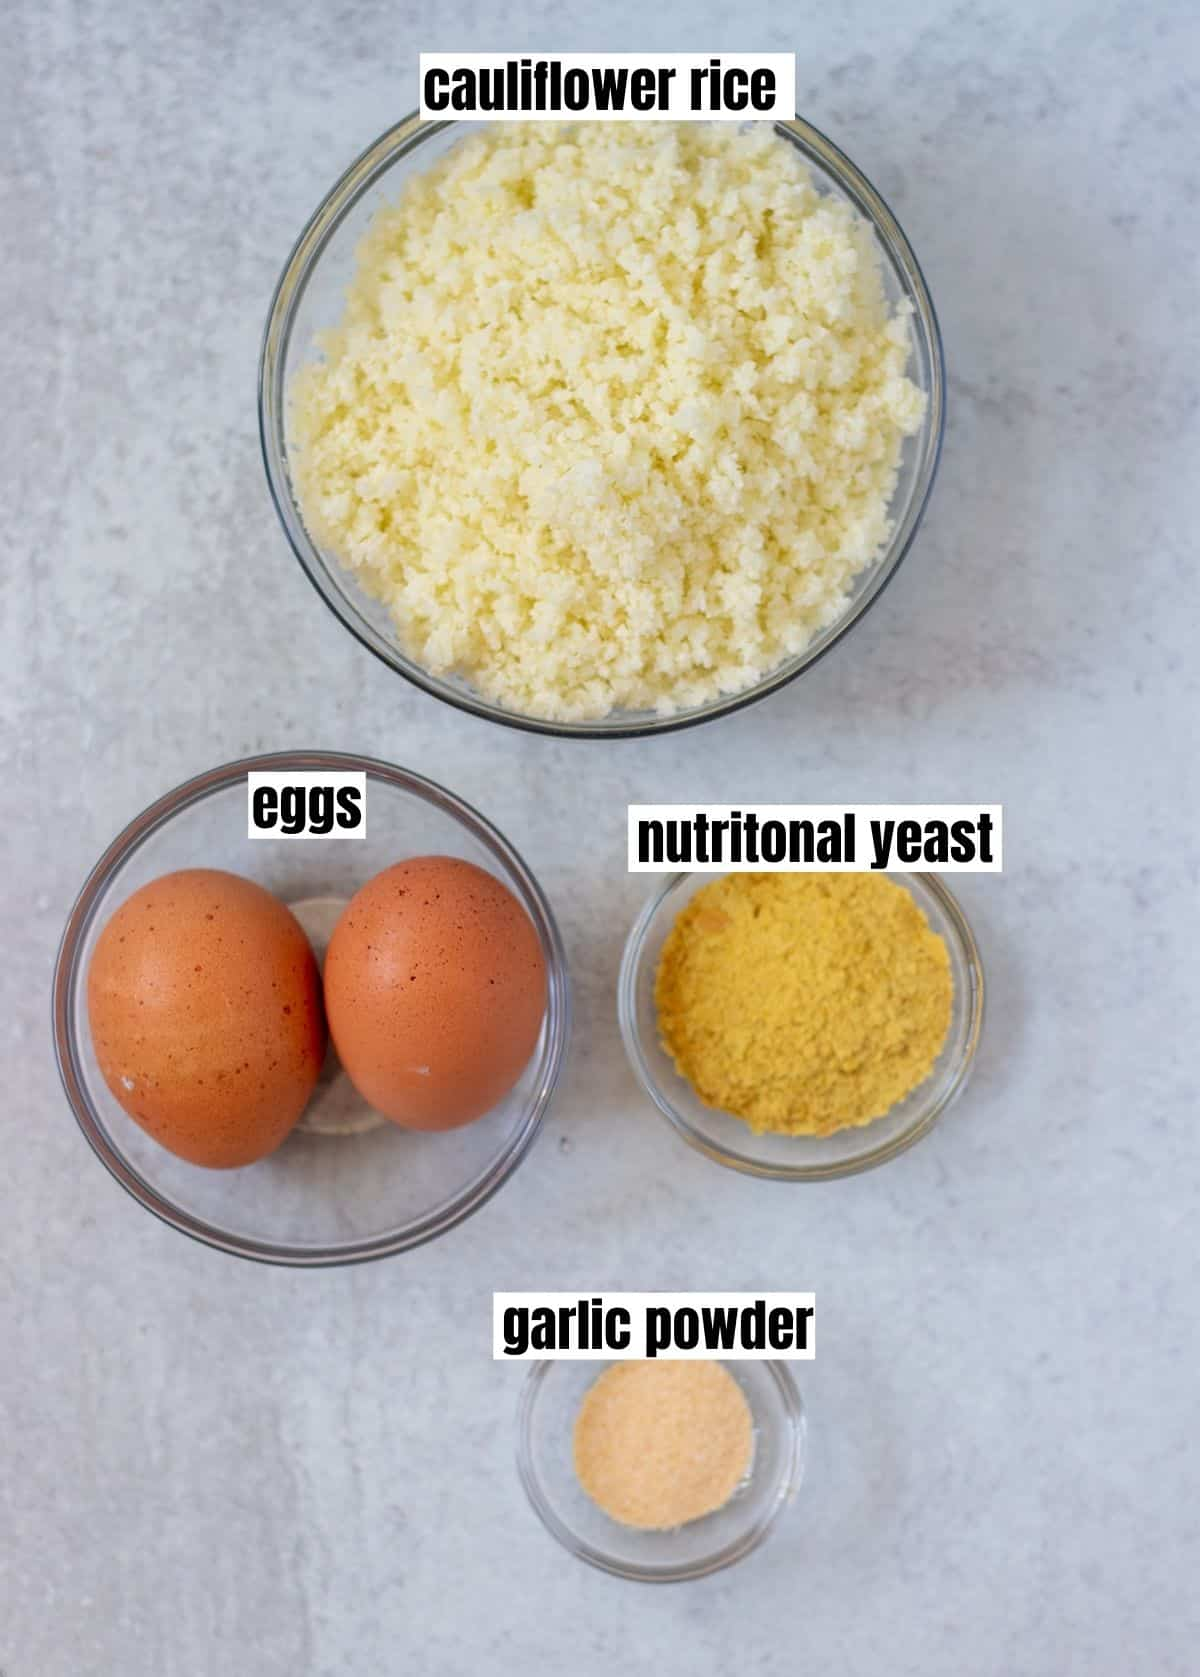 cauliflower rice, eggs, nutritional yeast, garlic powder